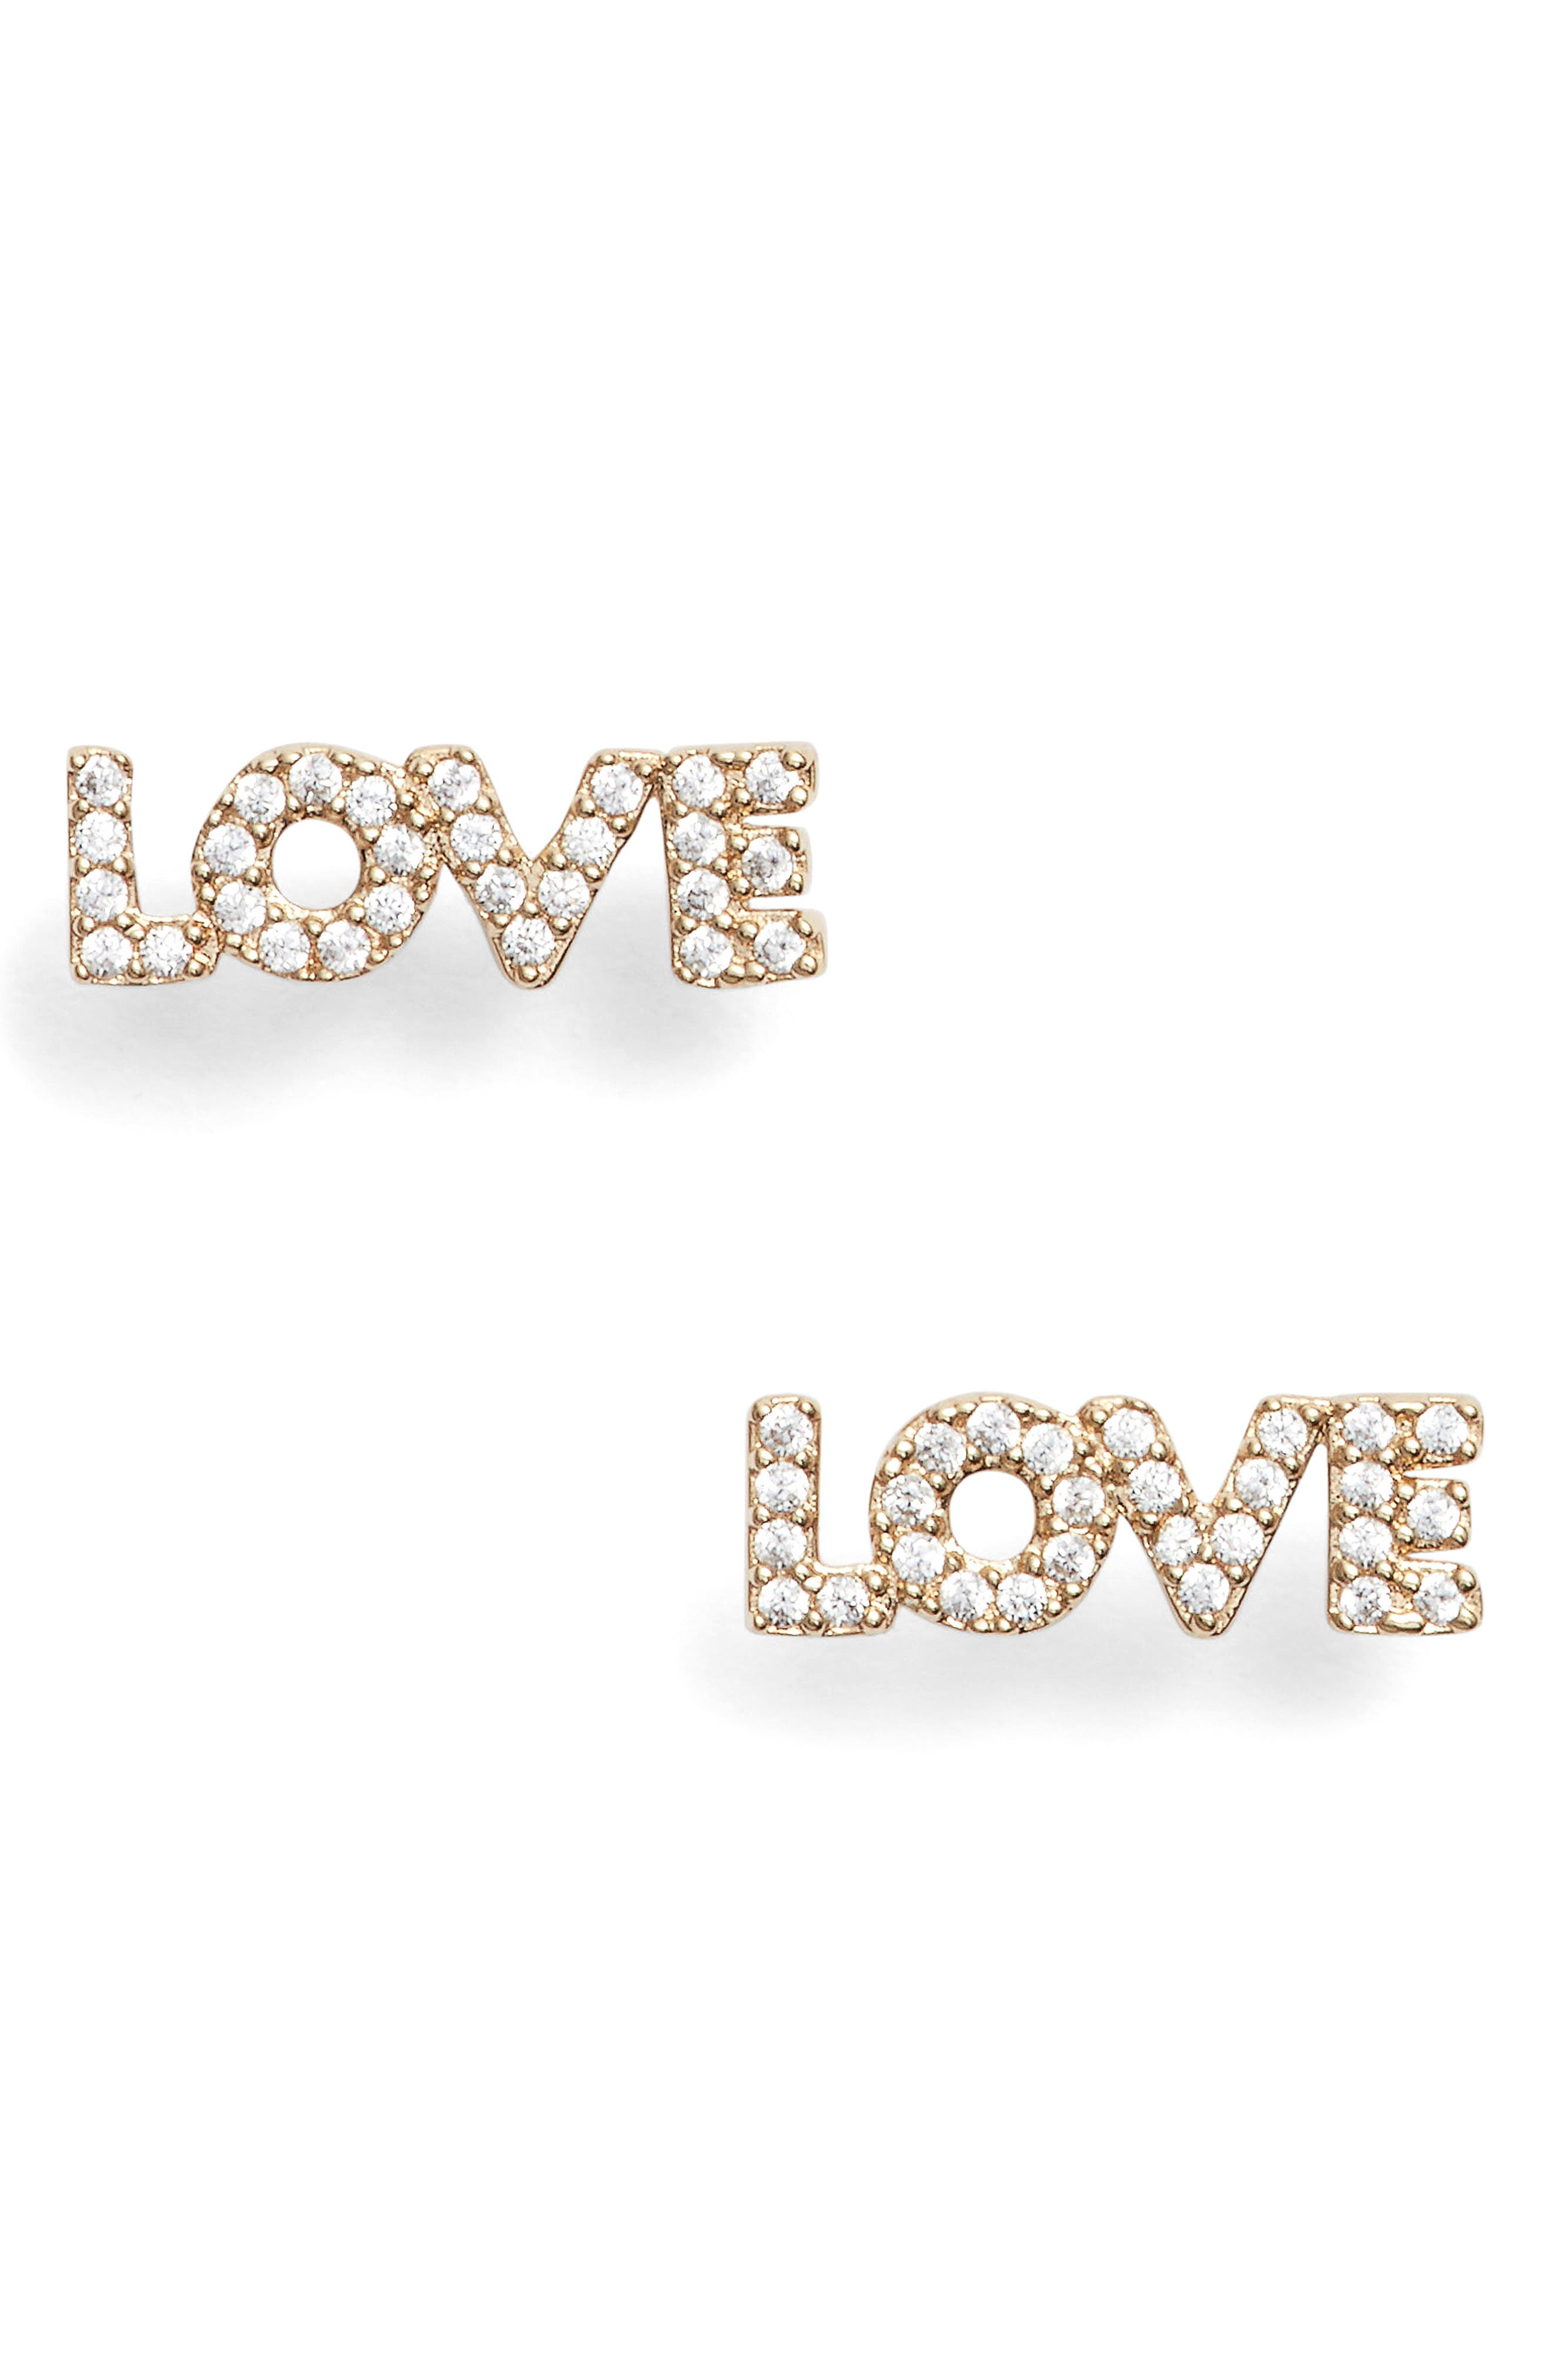 Main Image - Nadri Love Earrings